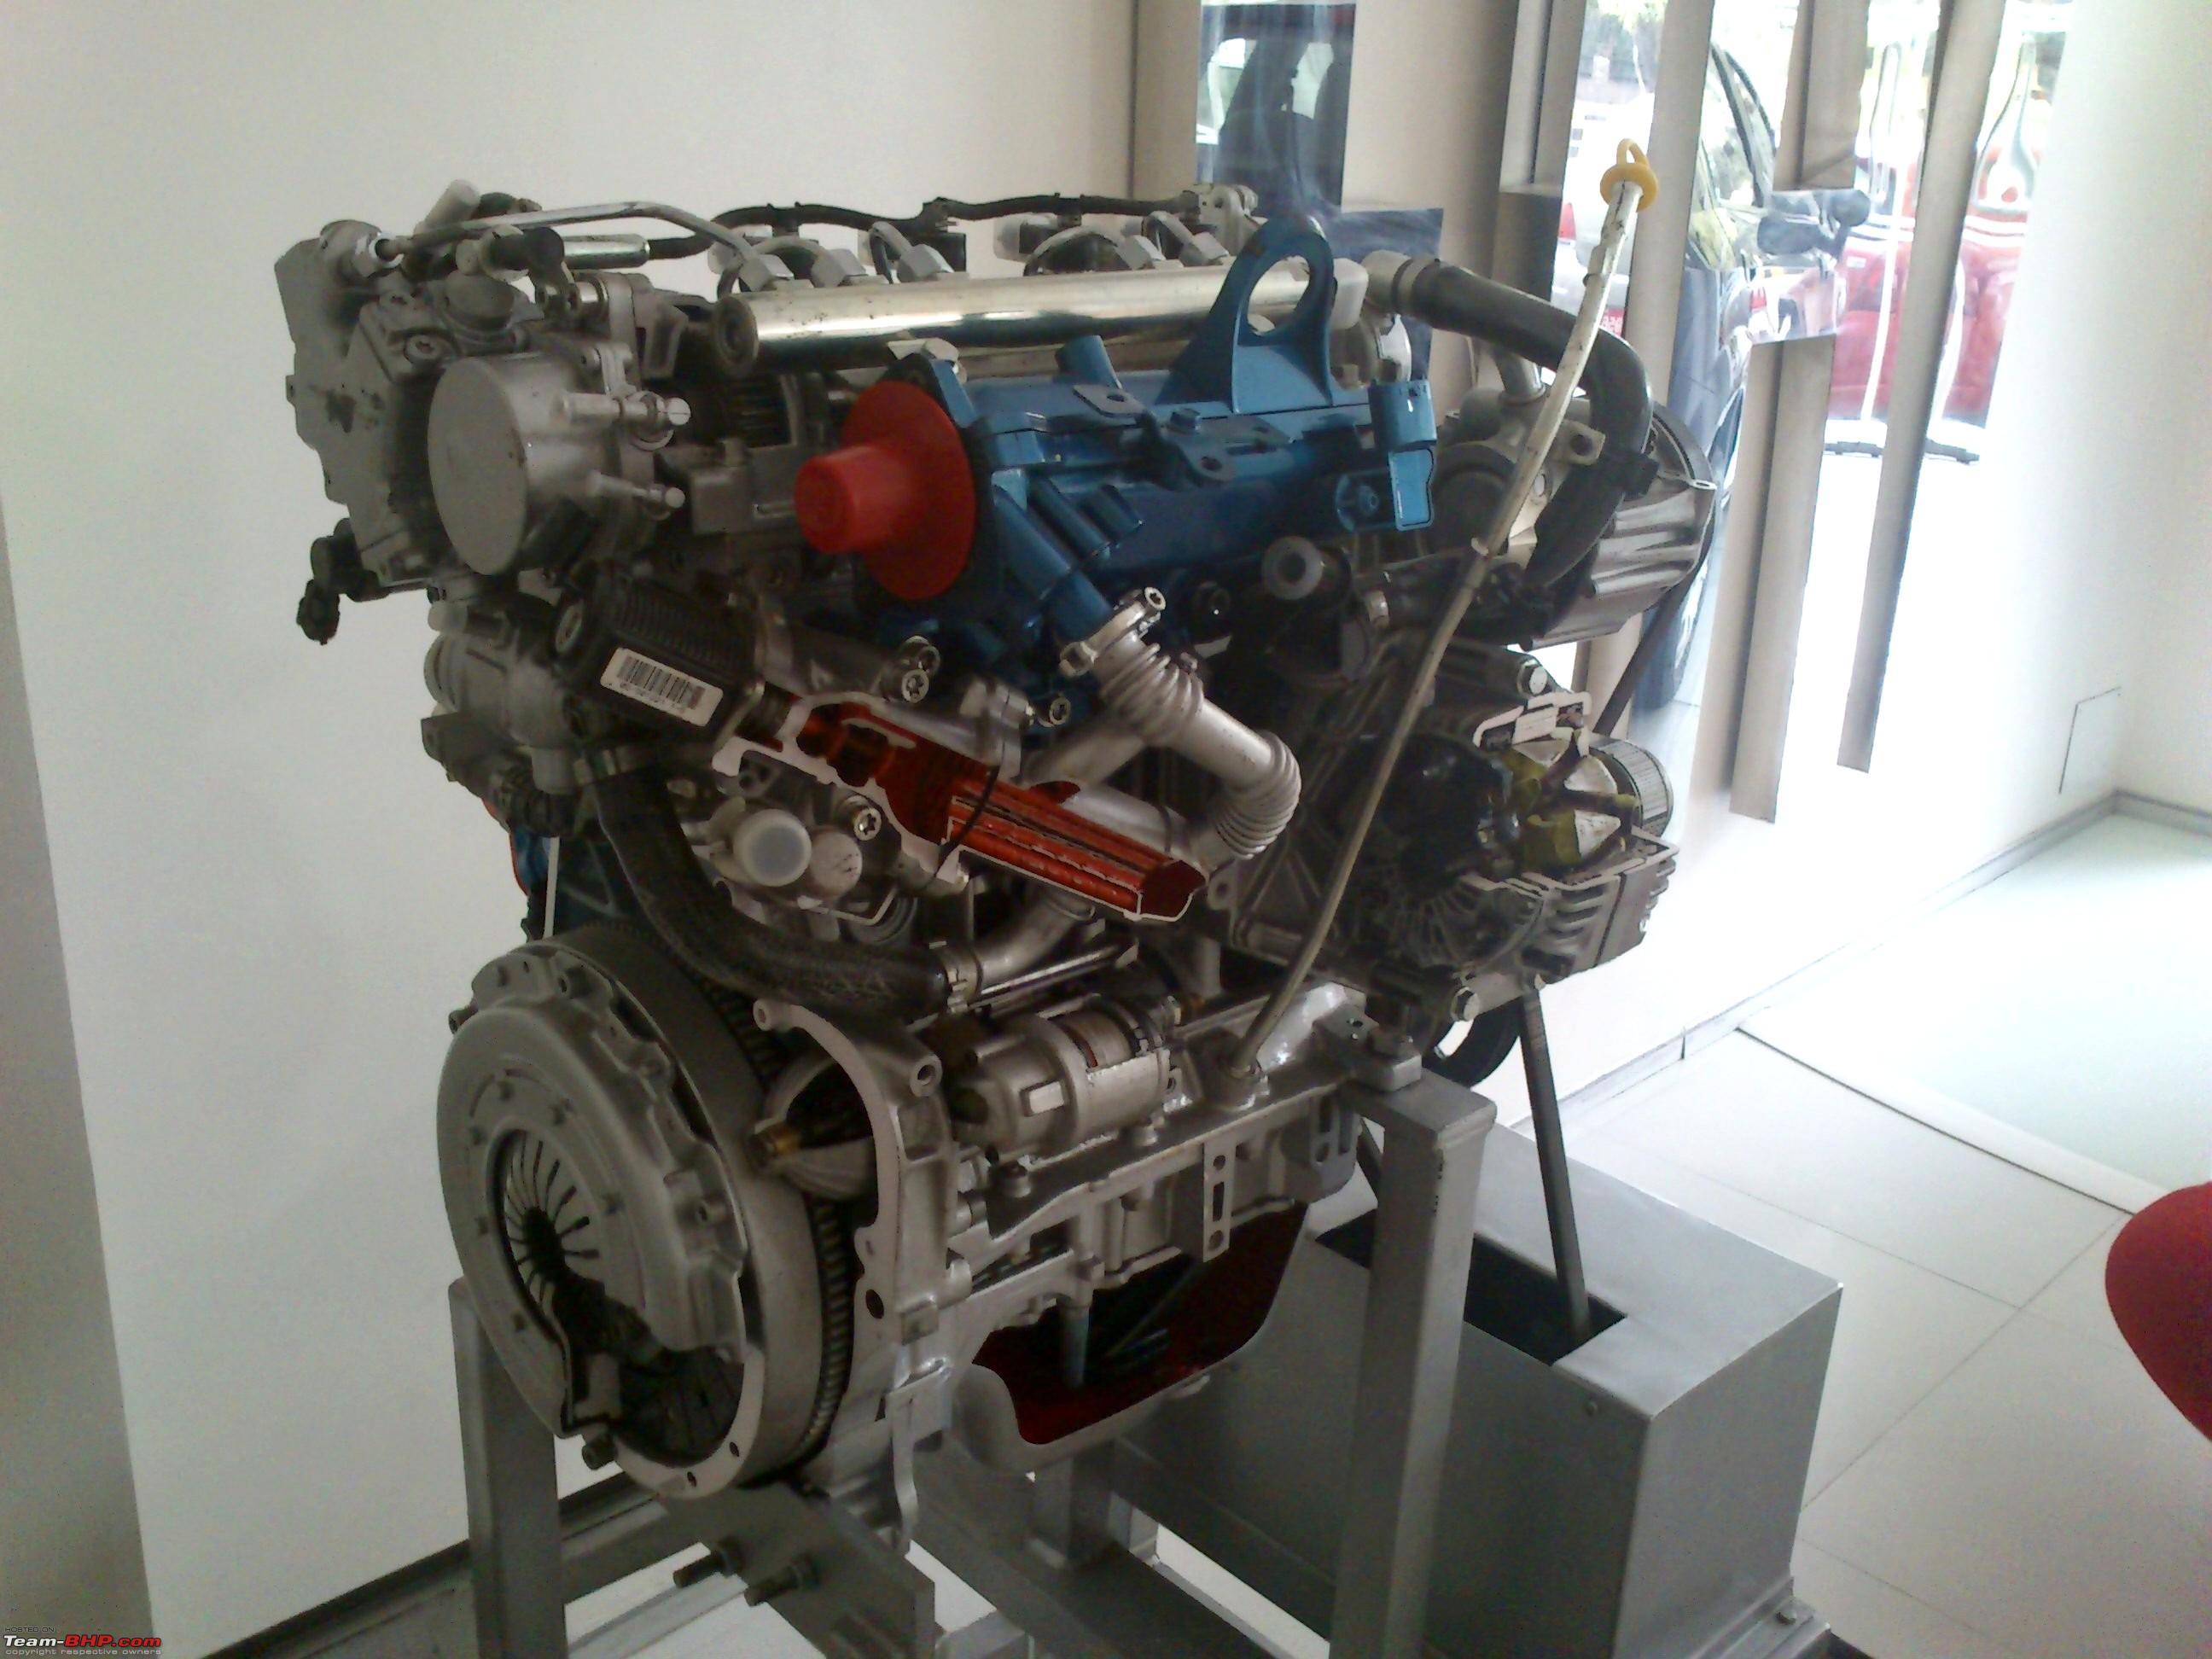 Fiat panda 1.3 multijet diesel 2007 valutazione su Usato ...